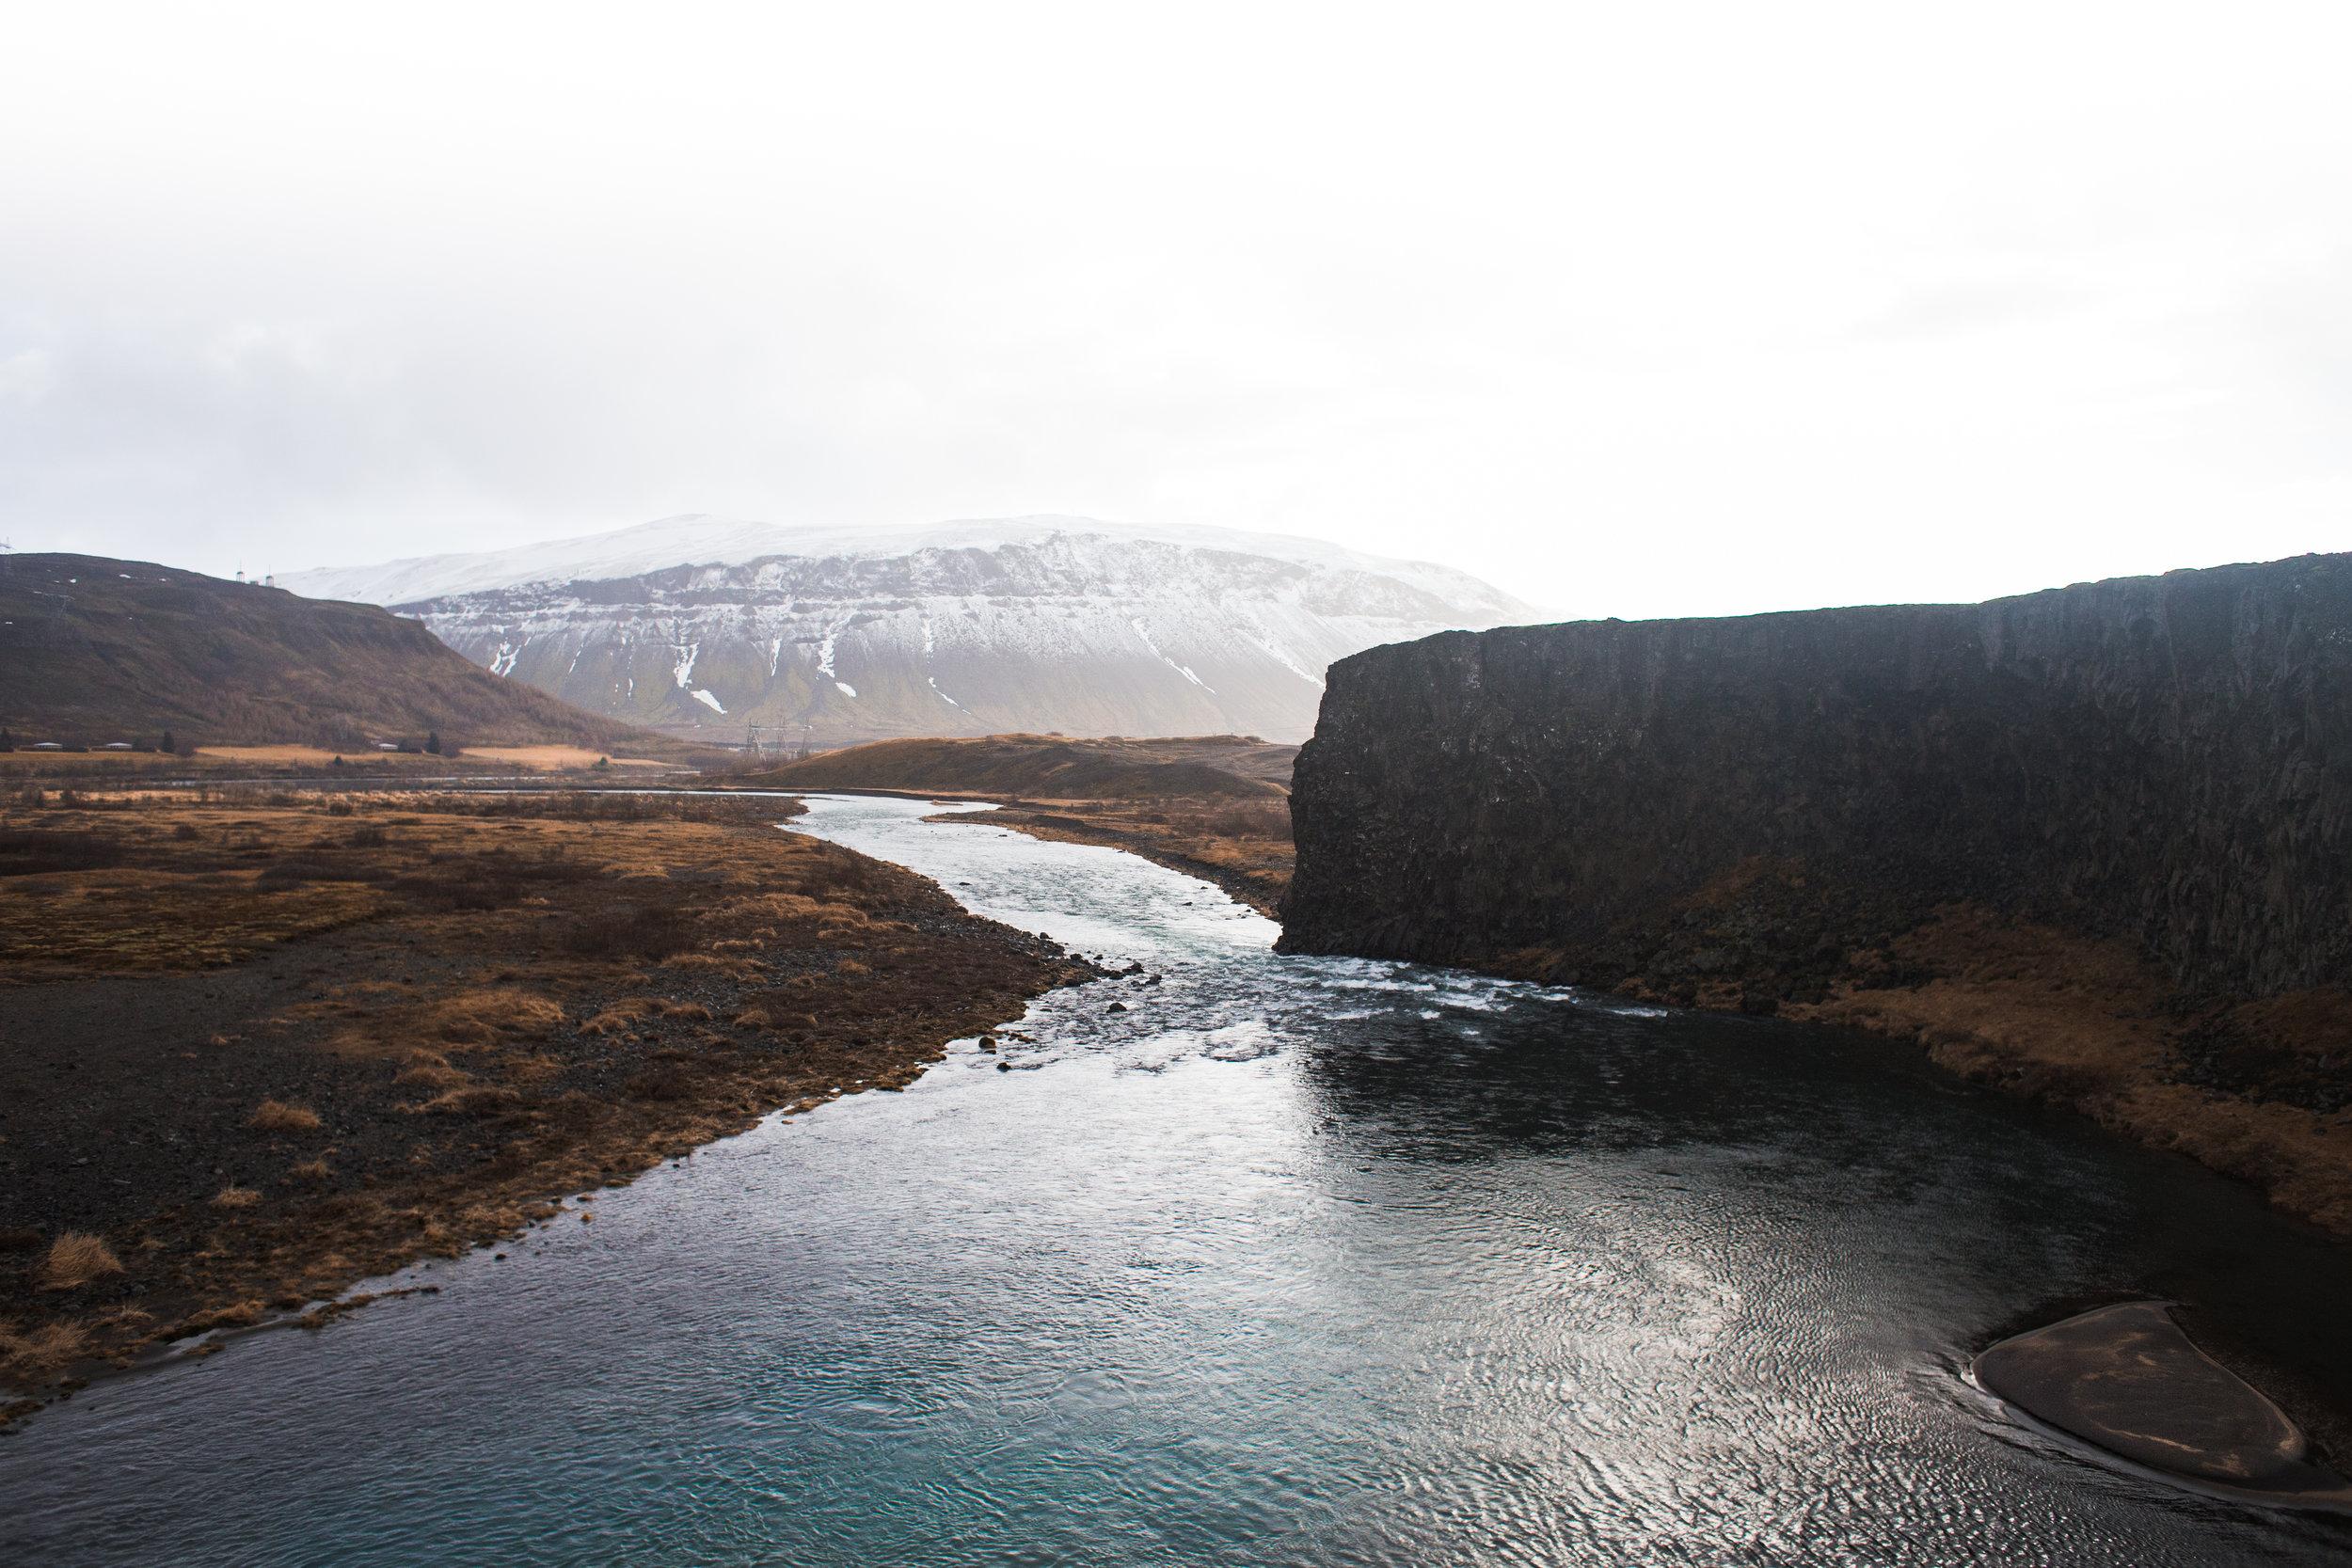 jermiah-schuster-iceland-47.jpg